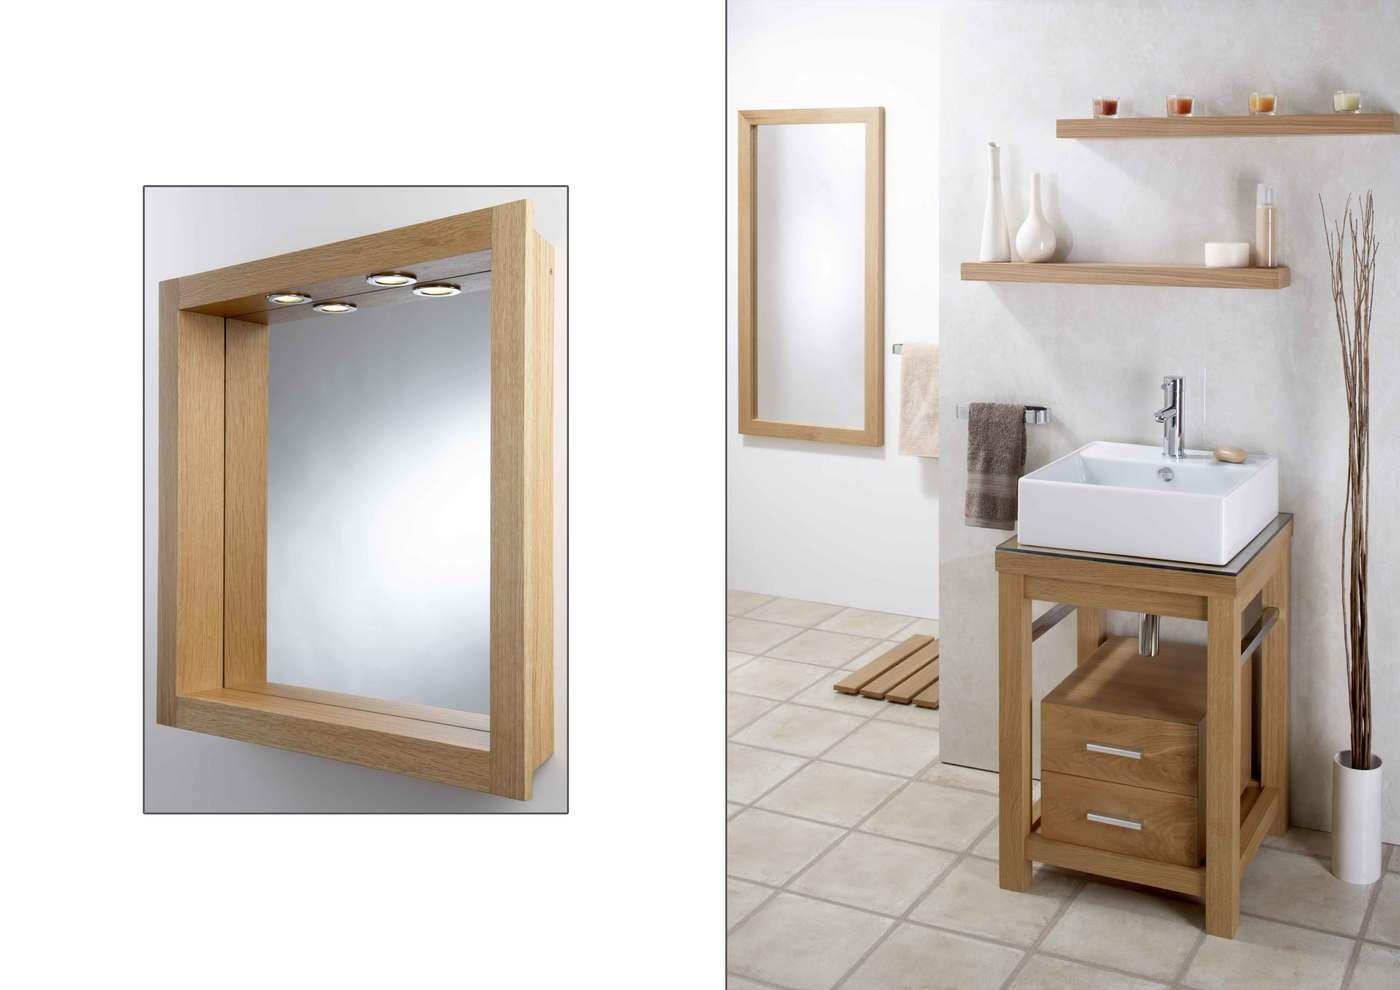 Oak Bathroom Accessories Best Home Design 2018